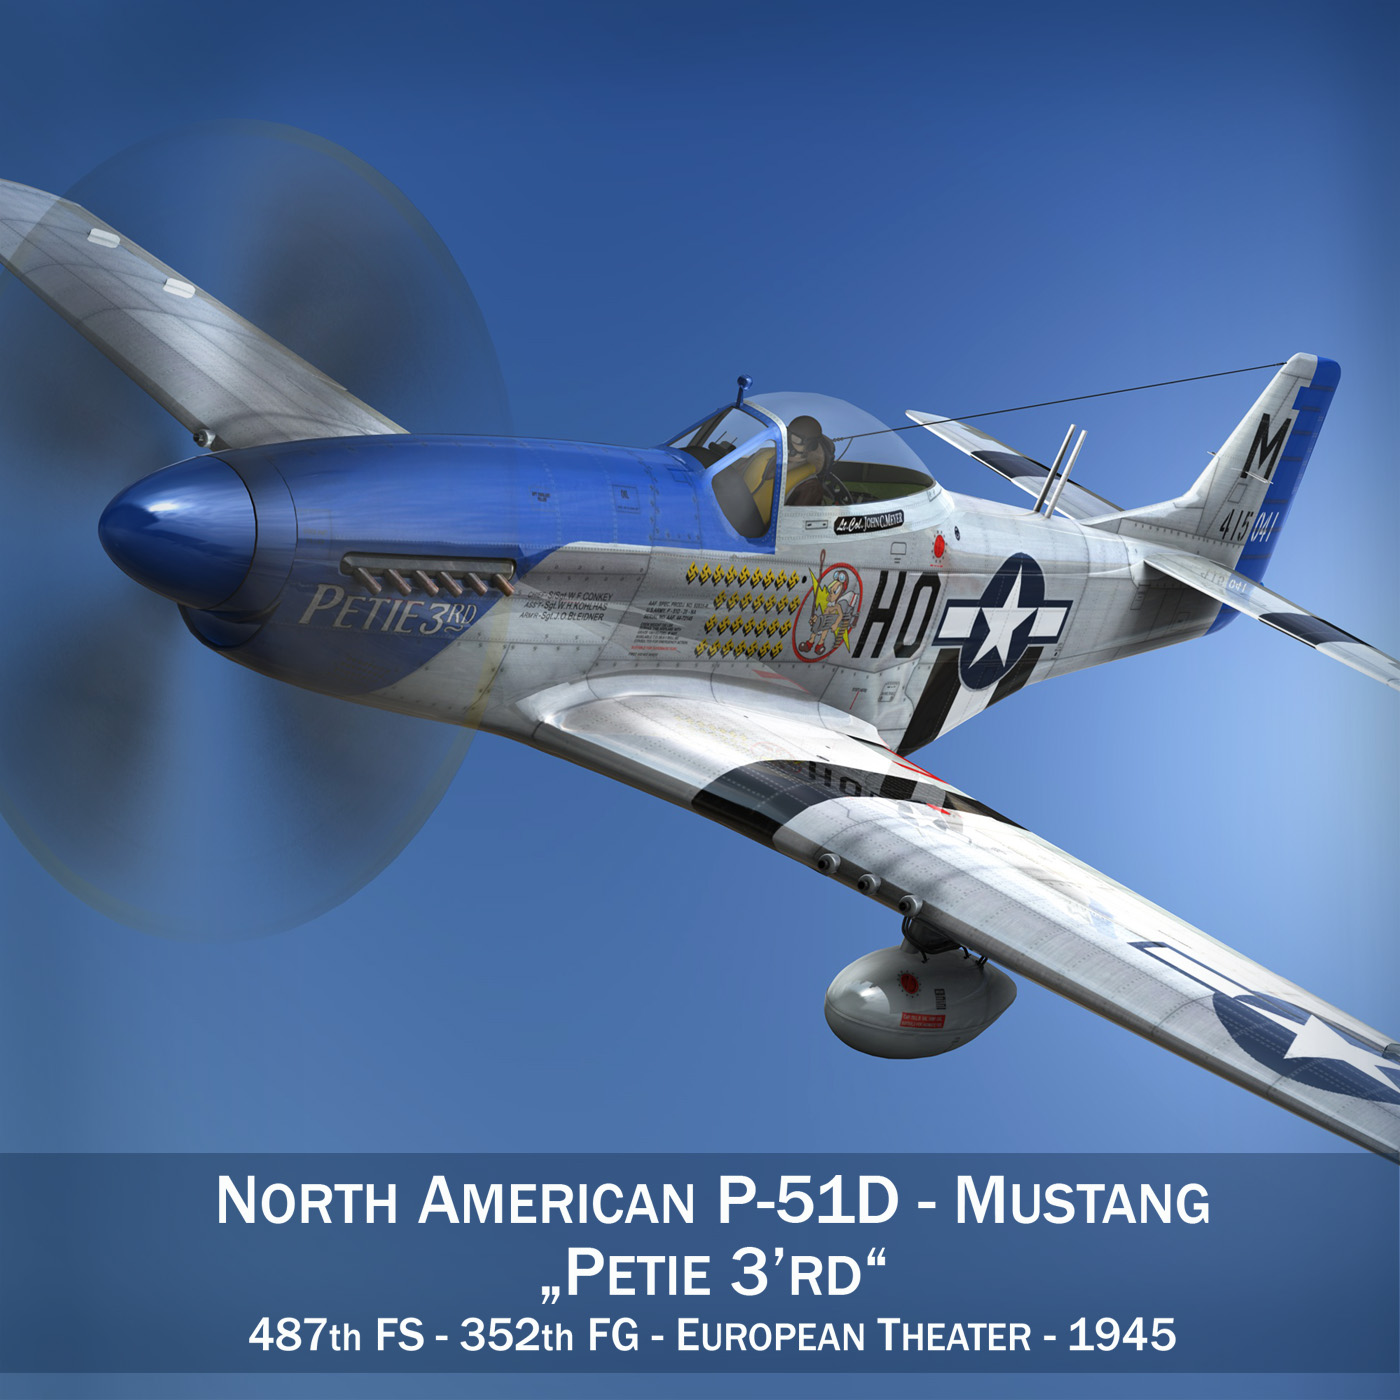 North American P-51D Mustang - Petie 3rd 3d model fbx c4d lwo lws lw obj 280127